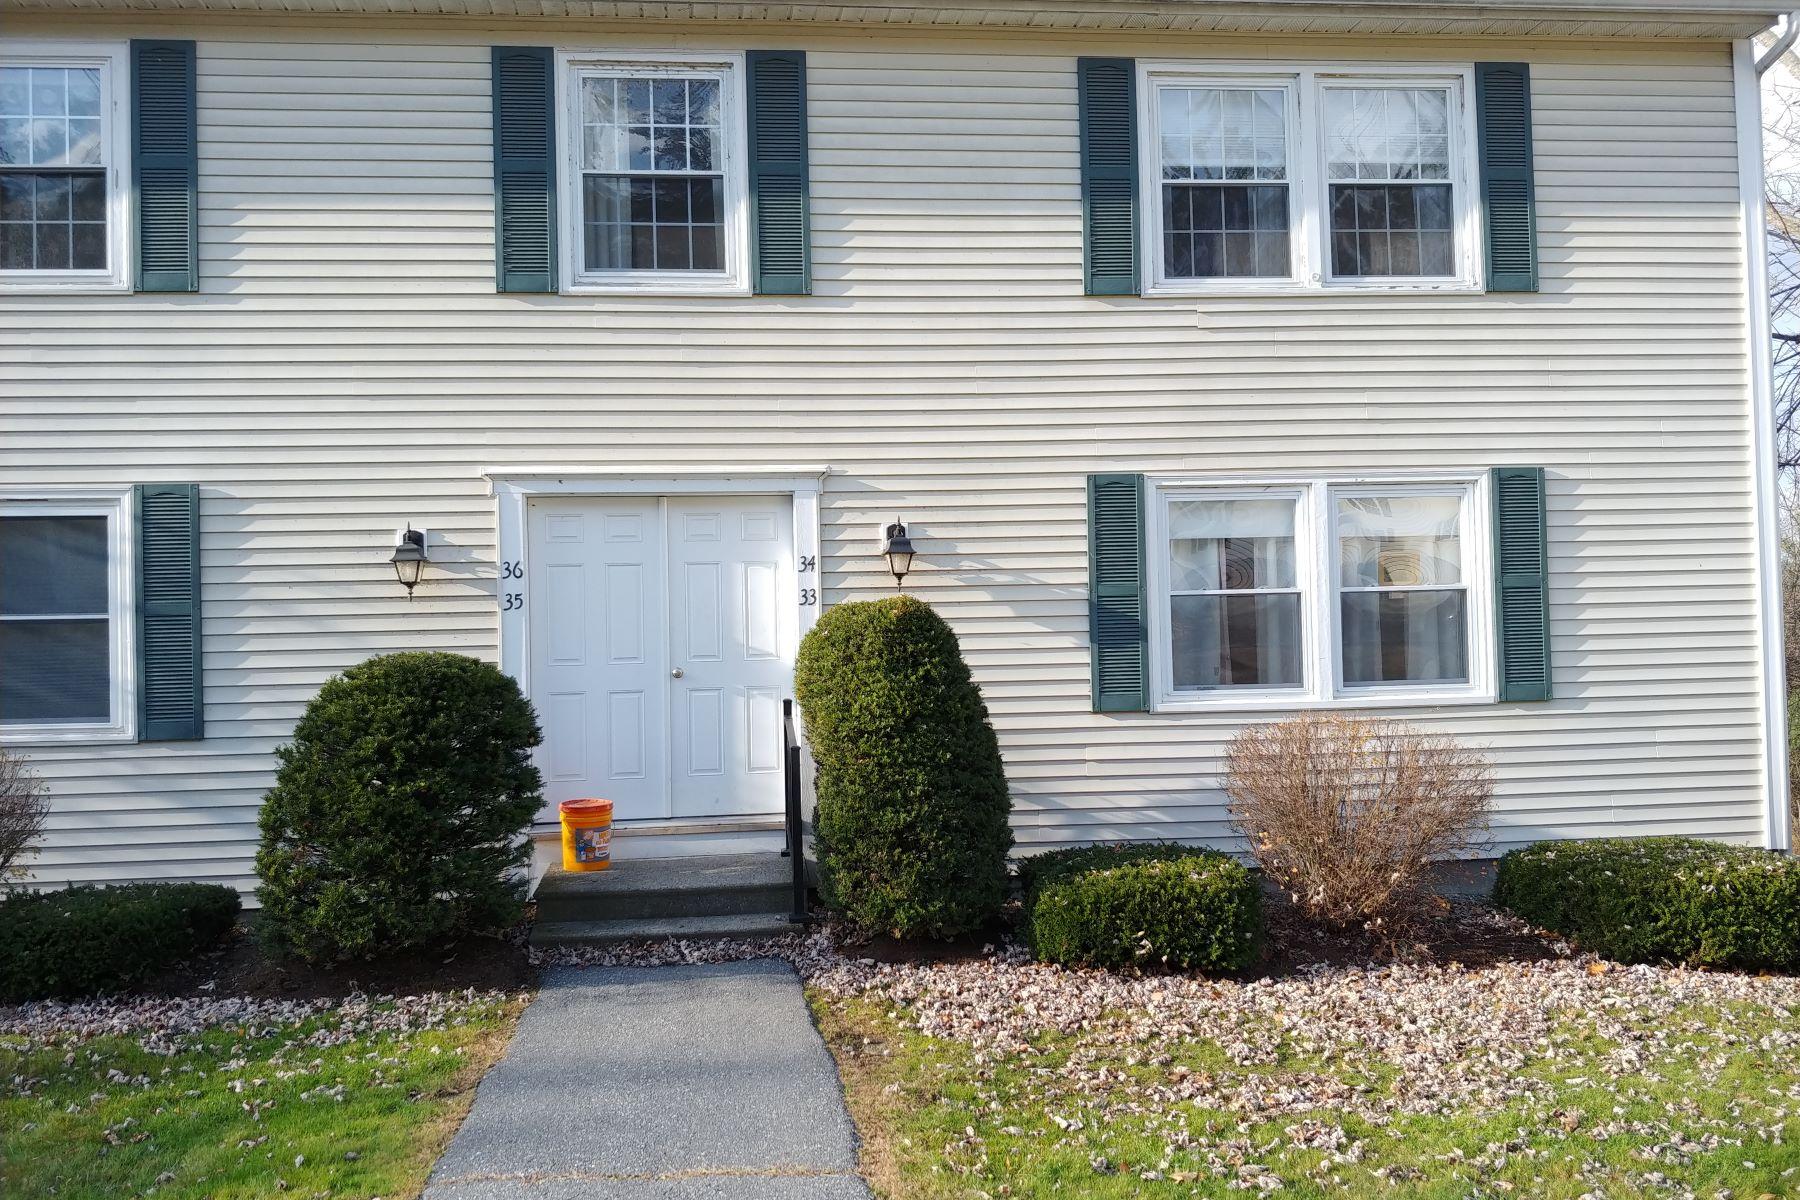 Condominiums for Sale at Two Bedroom Condo in Lebanon 204 Mechanic Street Unit 34 Lebanon, New Hampshire 03766 United States